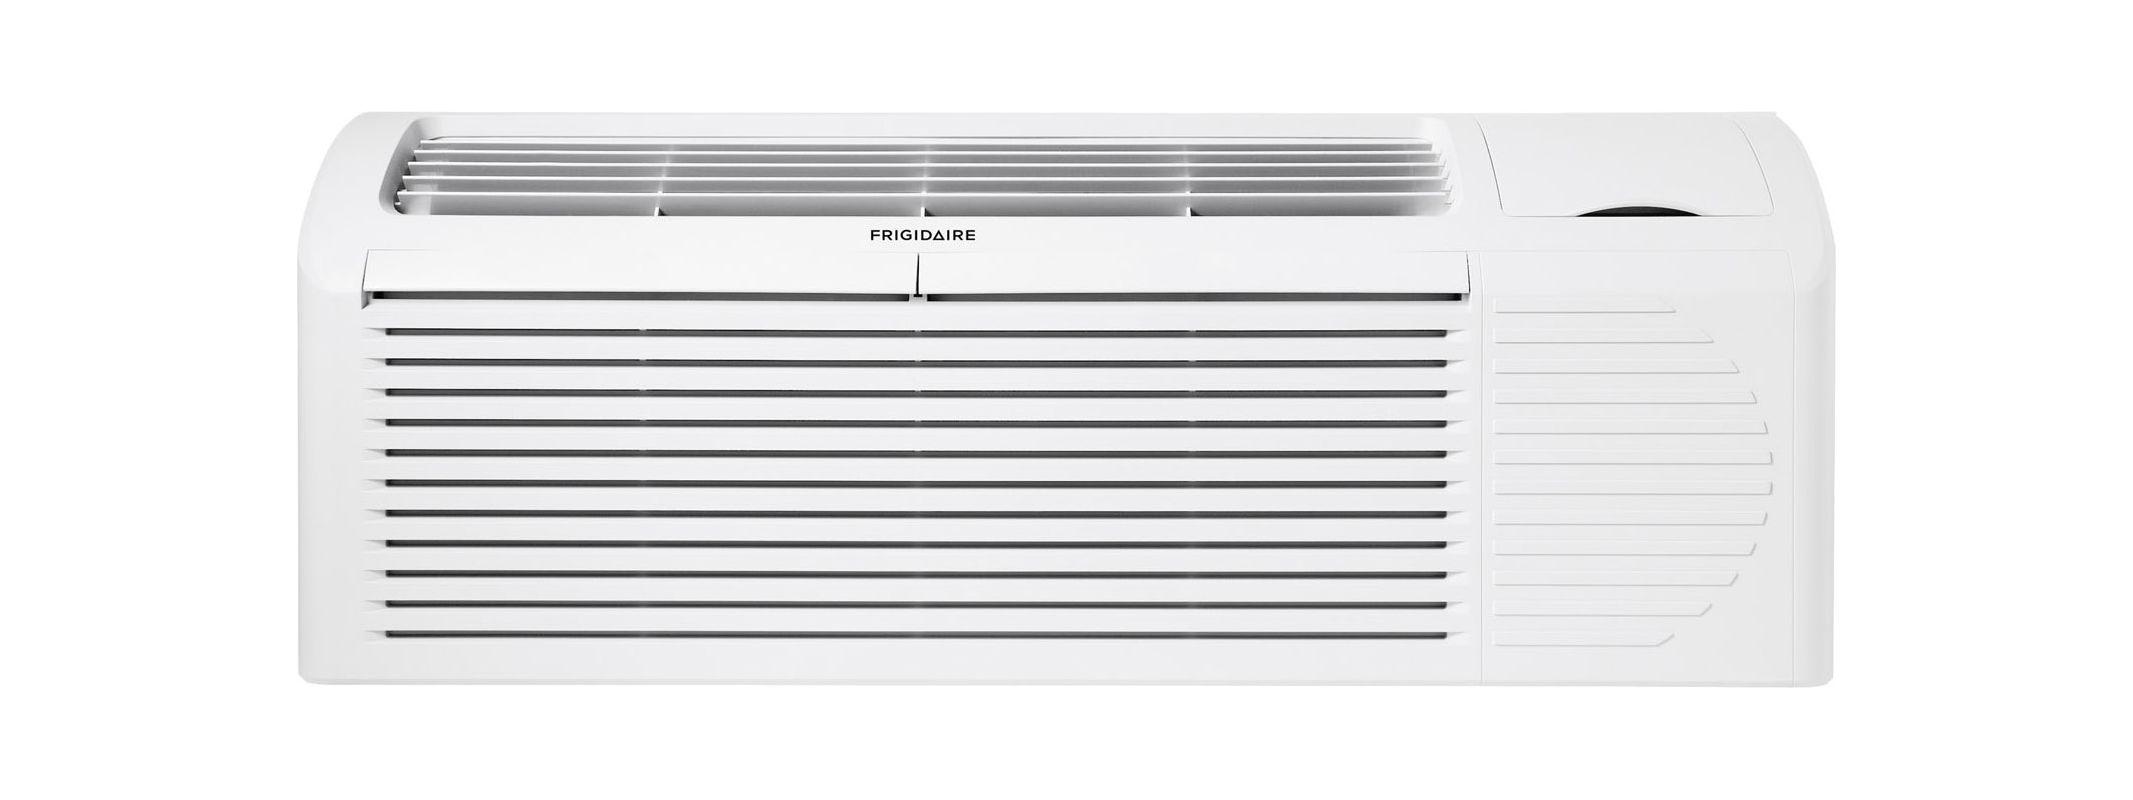 Frigidaire FRP90ETT3A 9,000 BTU 265 Volt Packaged Terminal Air Conditioner (PTAC photo